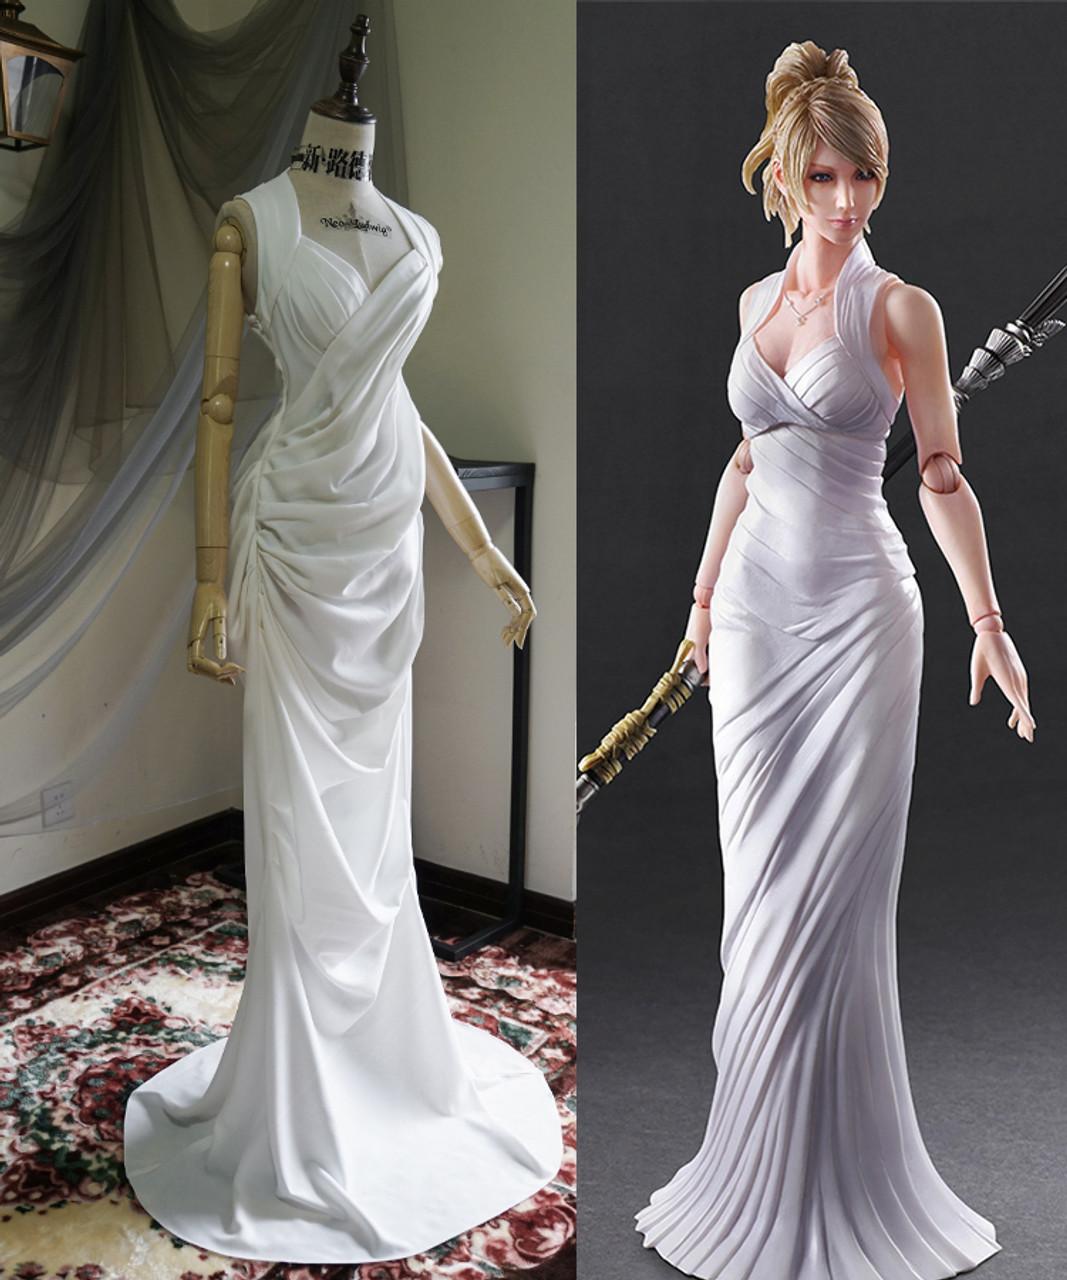 Final Fantasy Xv Game Cosplay Lunafreya Nox Fleuret